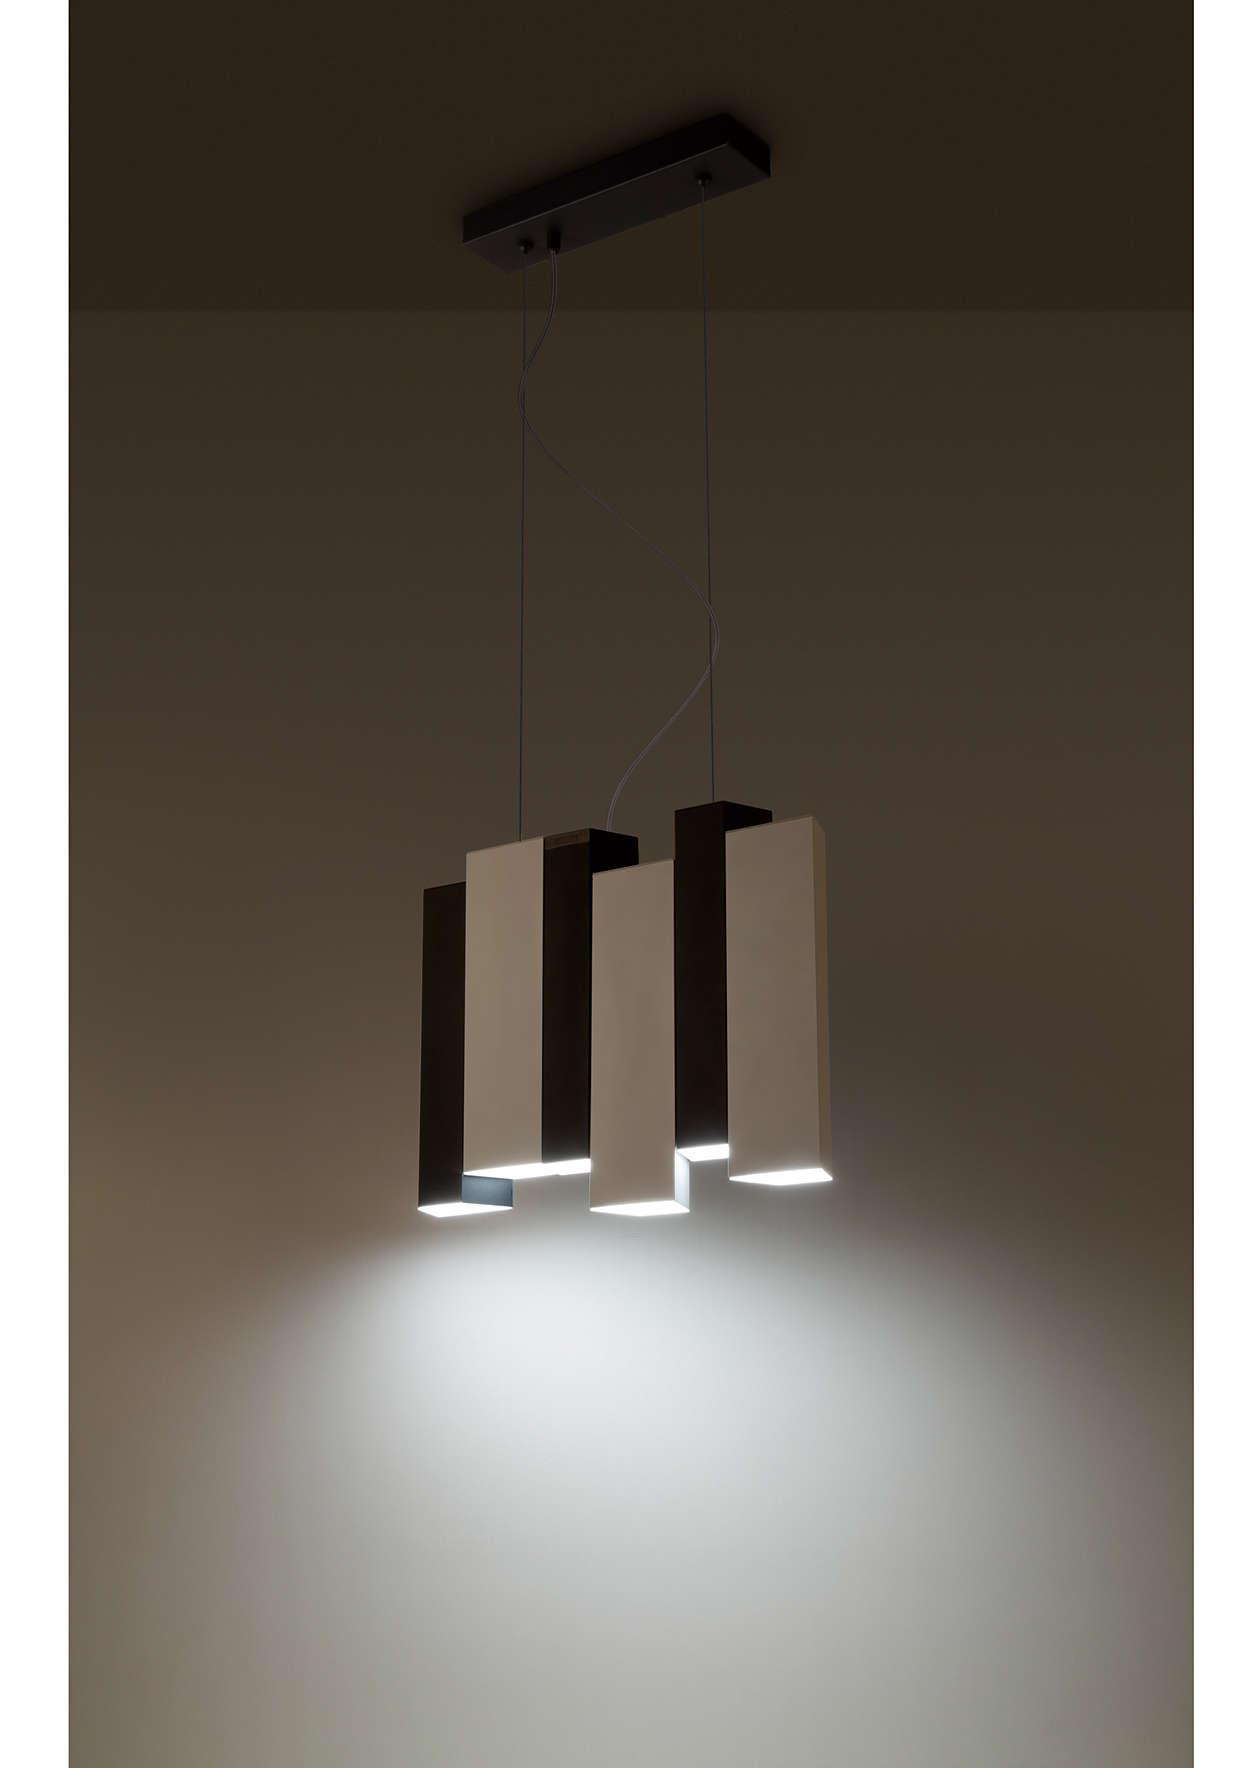 Suspension light 580823066 philips in light of perfection arubaitofo Gallery